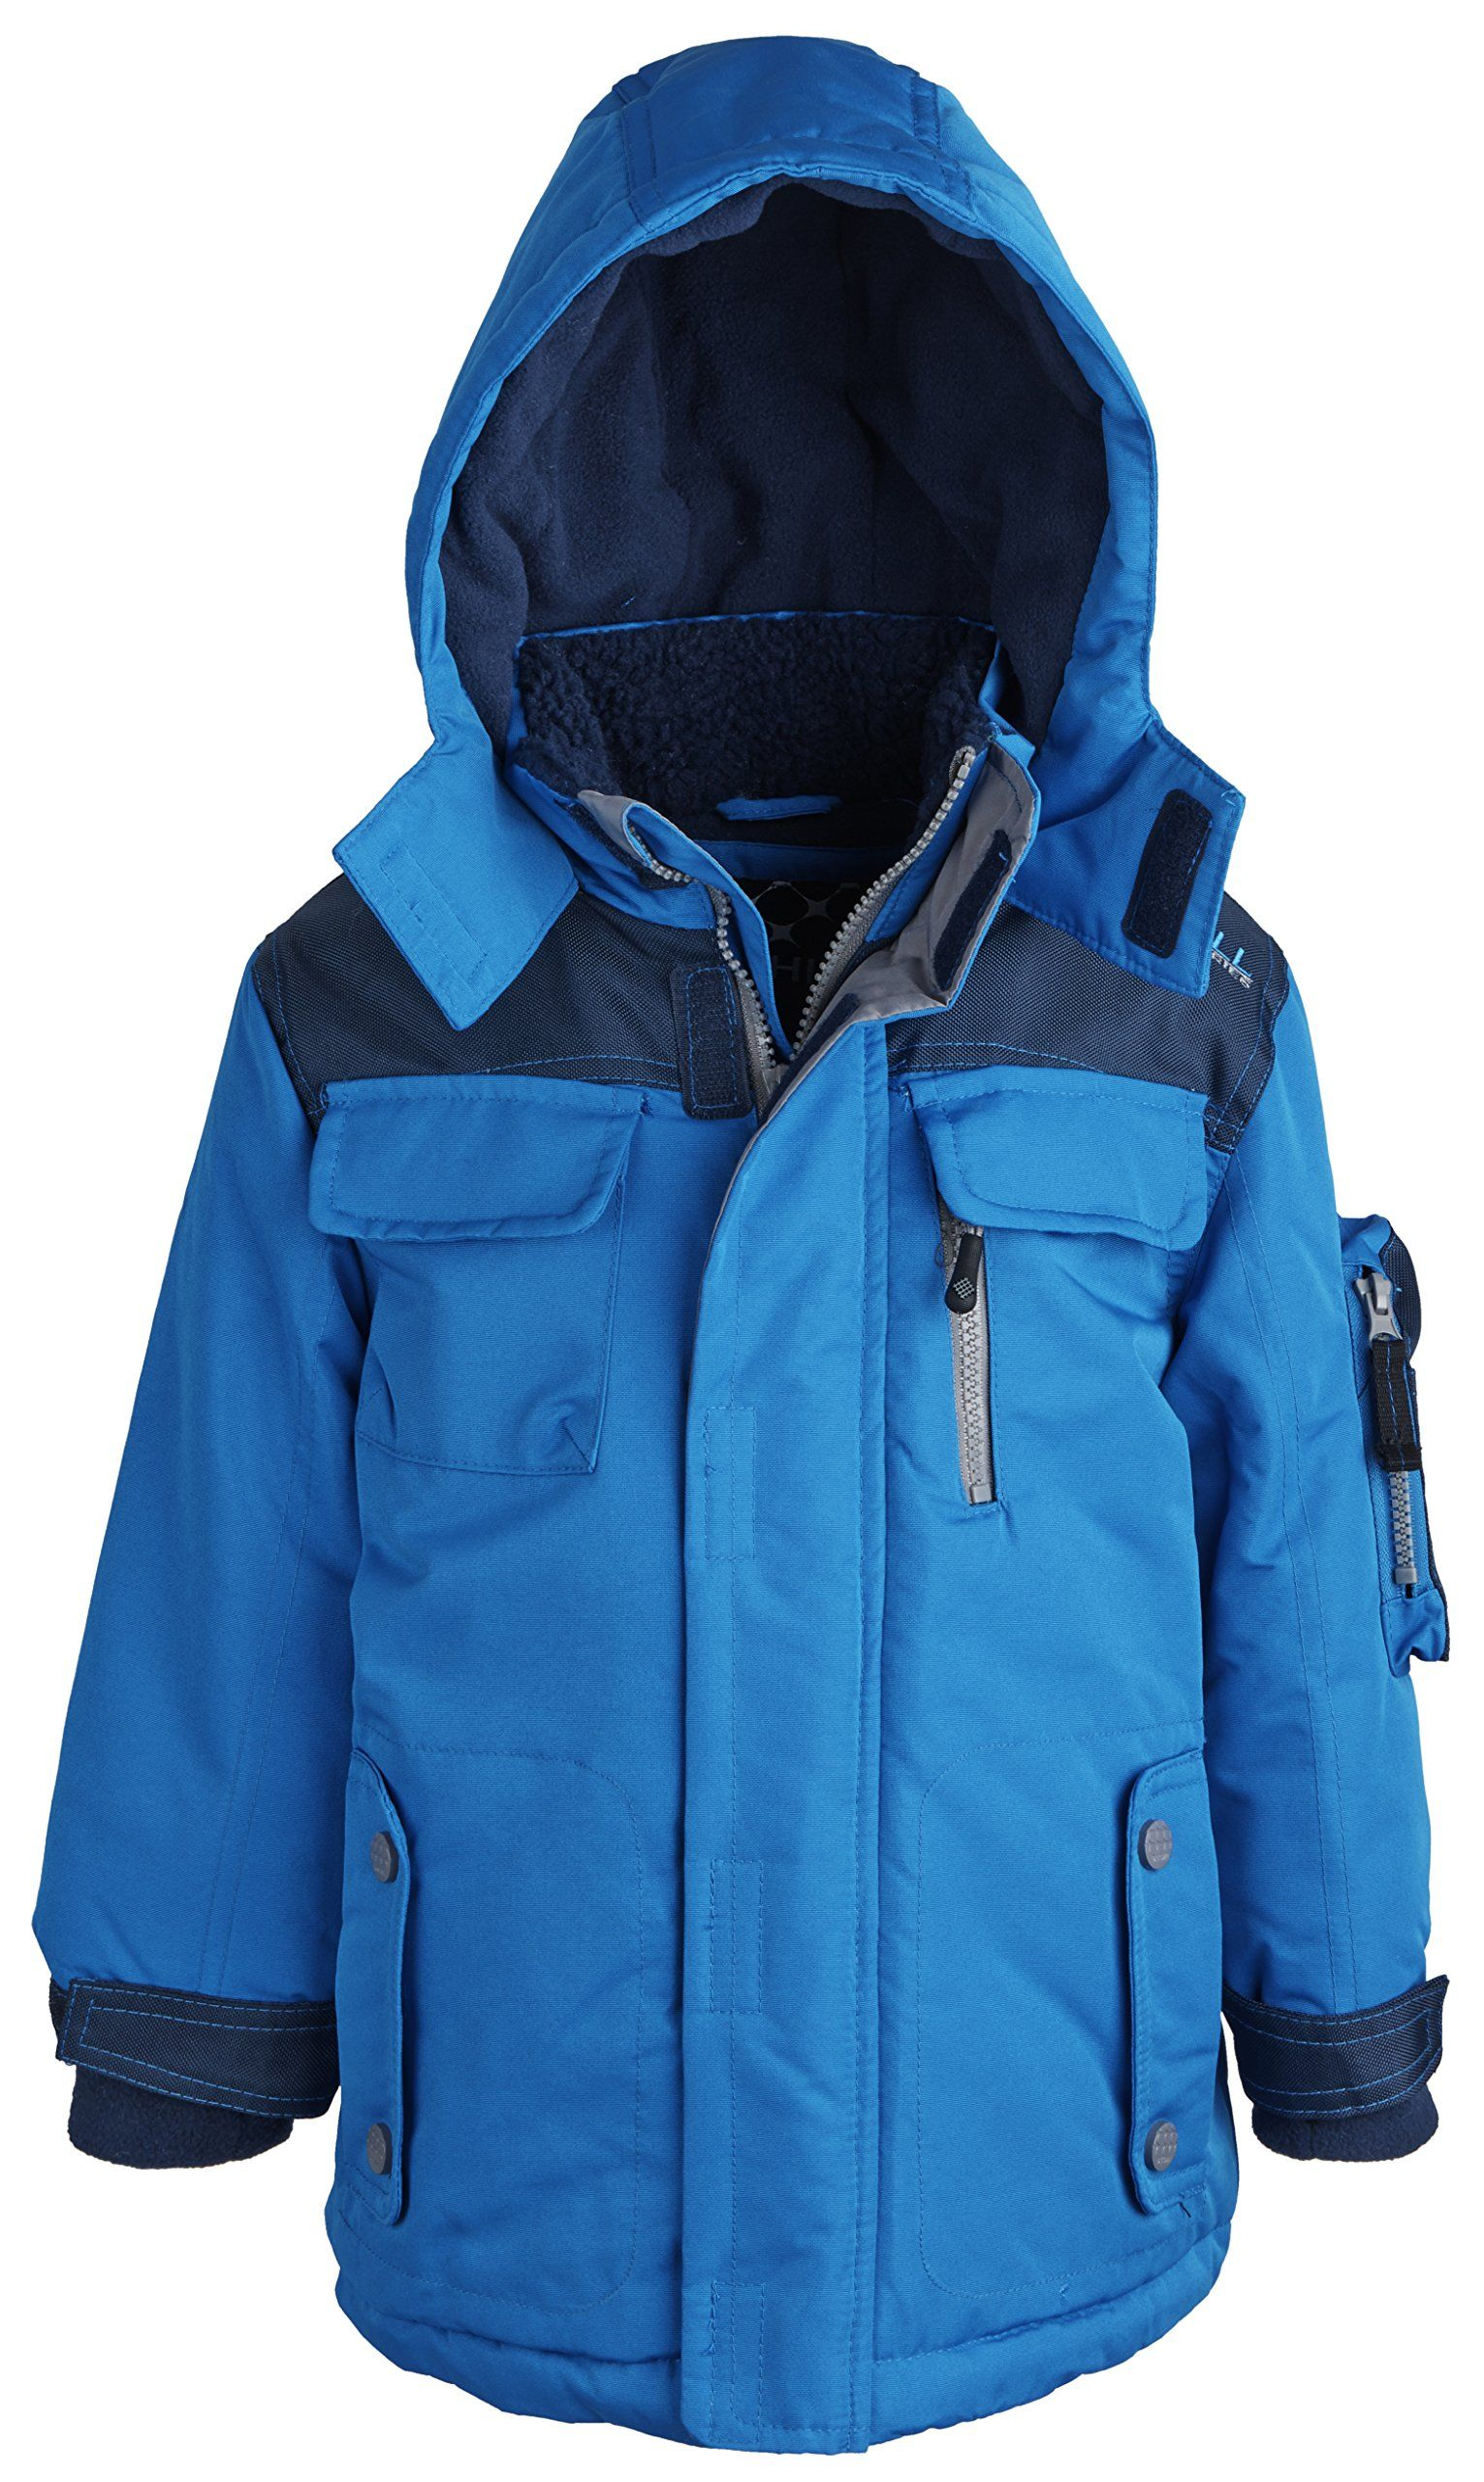 caa145025 Big Chill Little Boys Water Resistant Fleece Lined Snowboard Parka Puffer  Coat - Nautica (Size